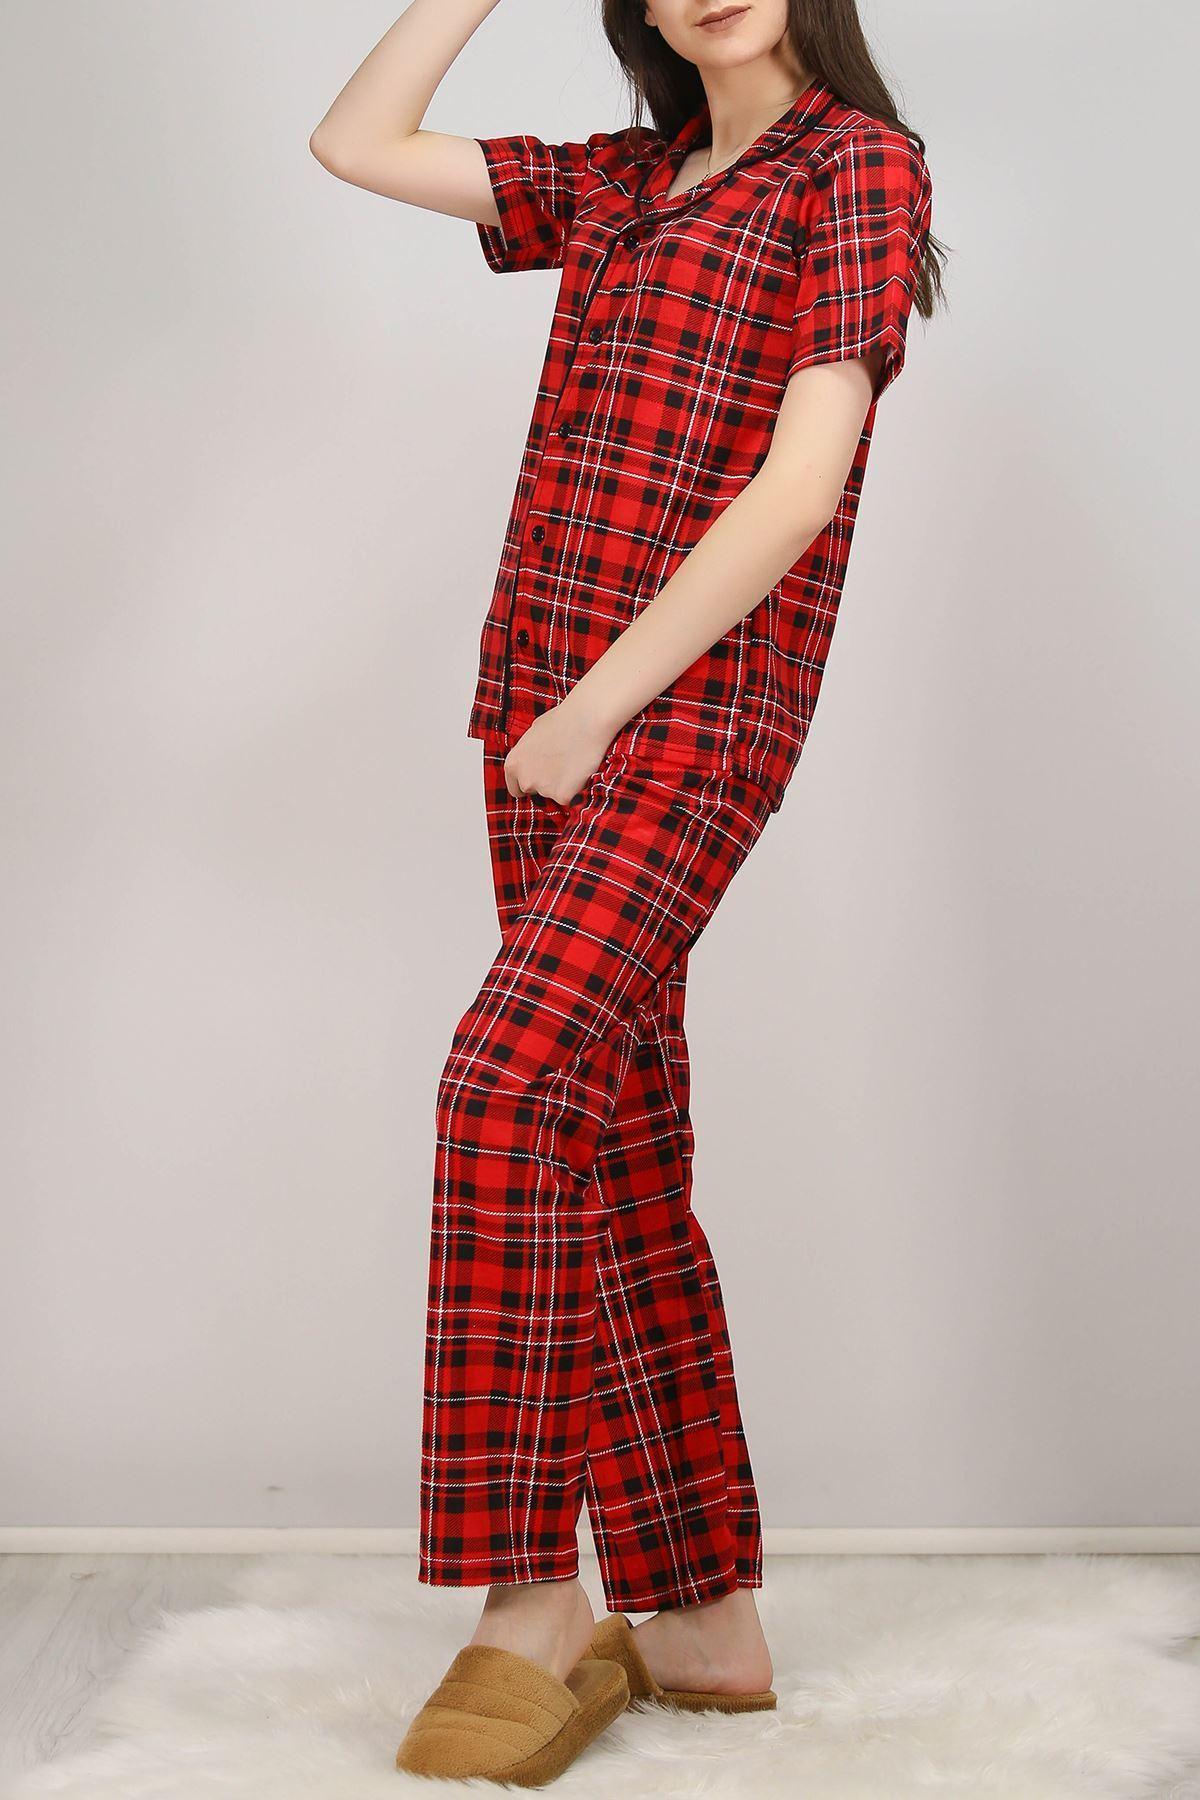 Düğmeli Pijama Takımı Siyahkırmızı - 4782.102.